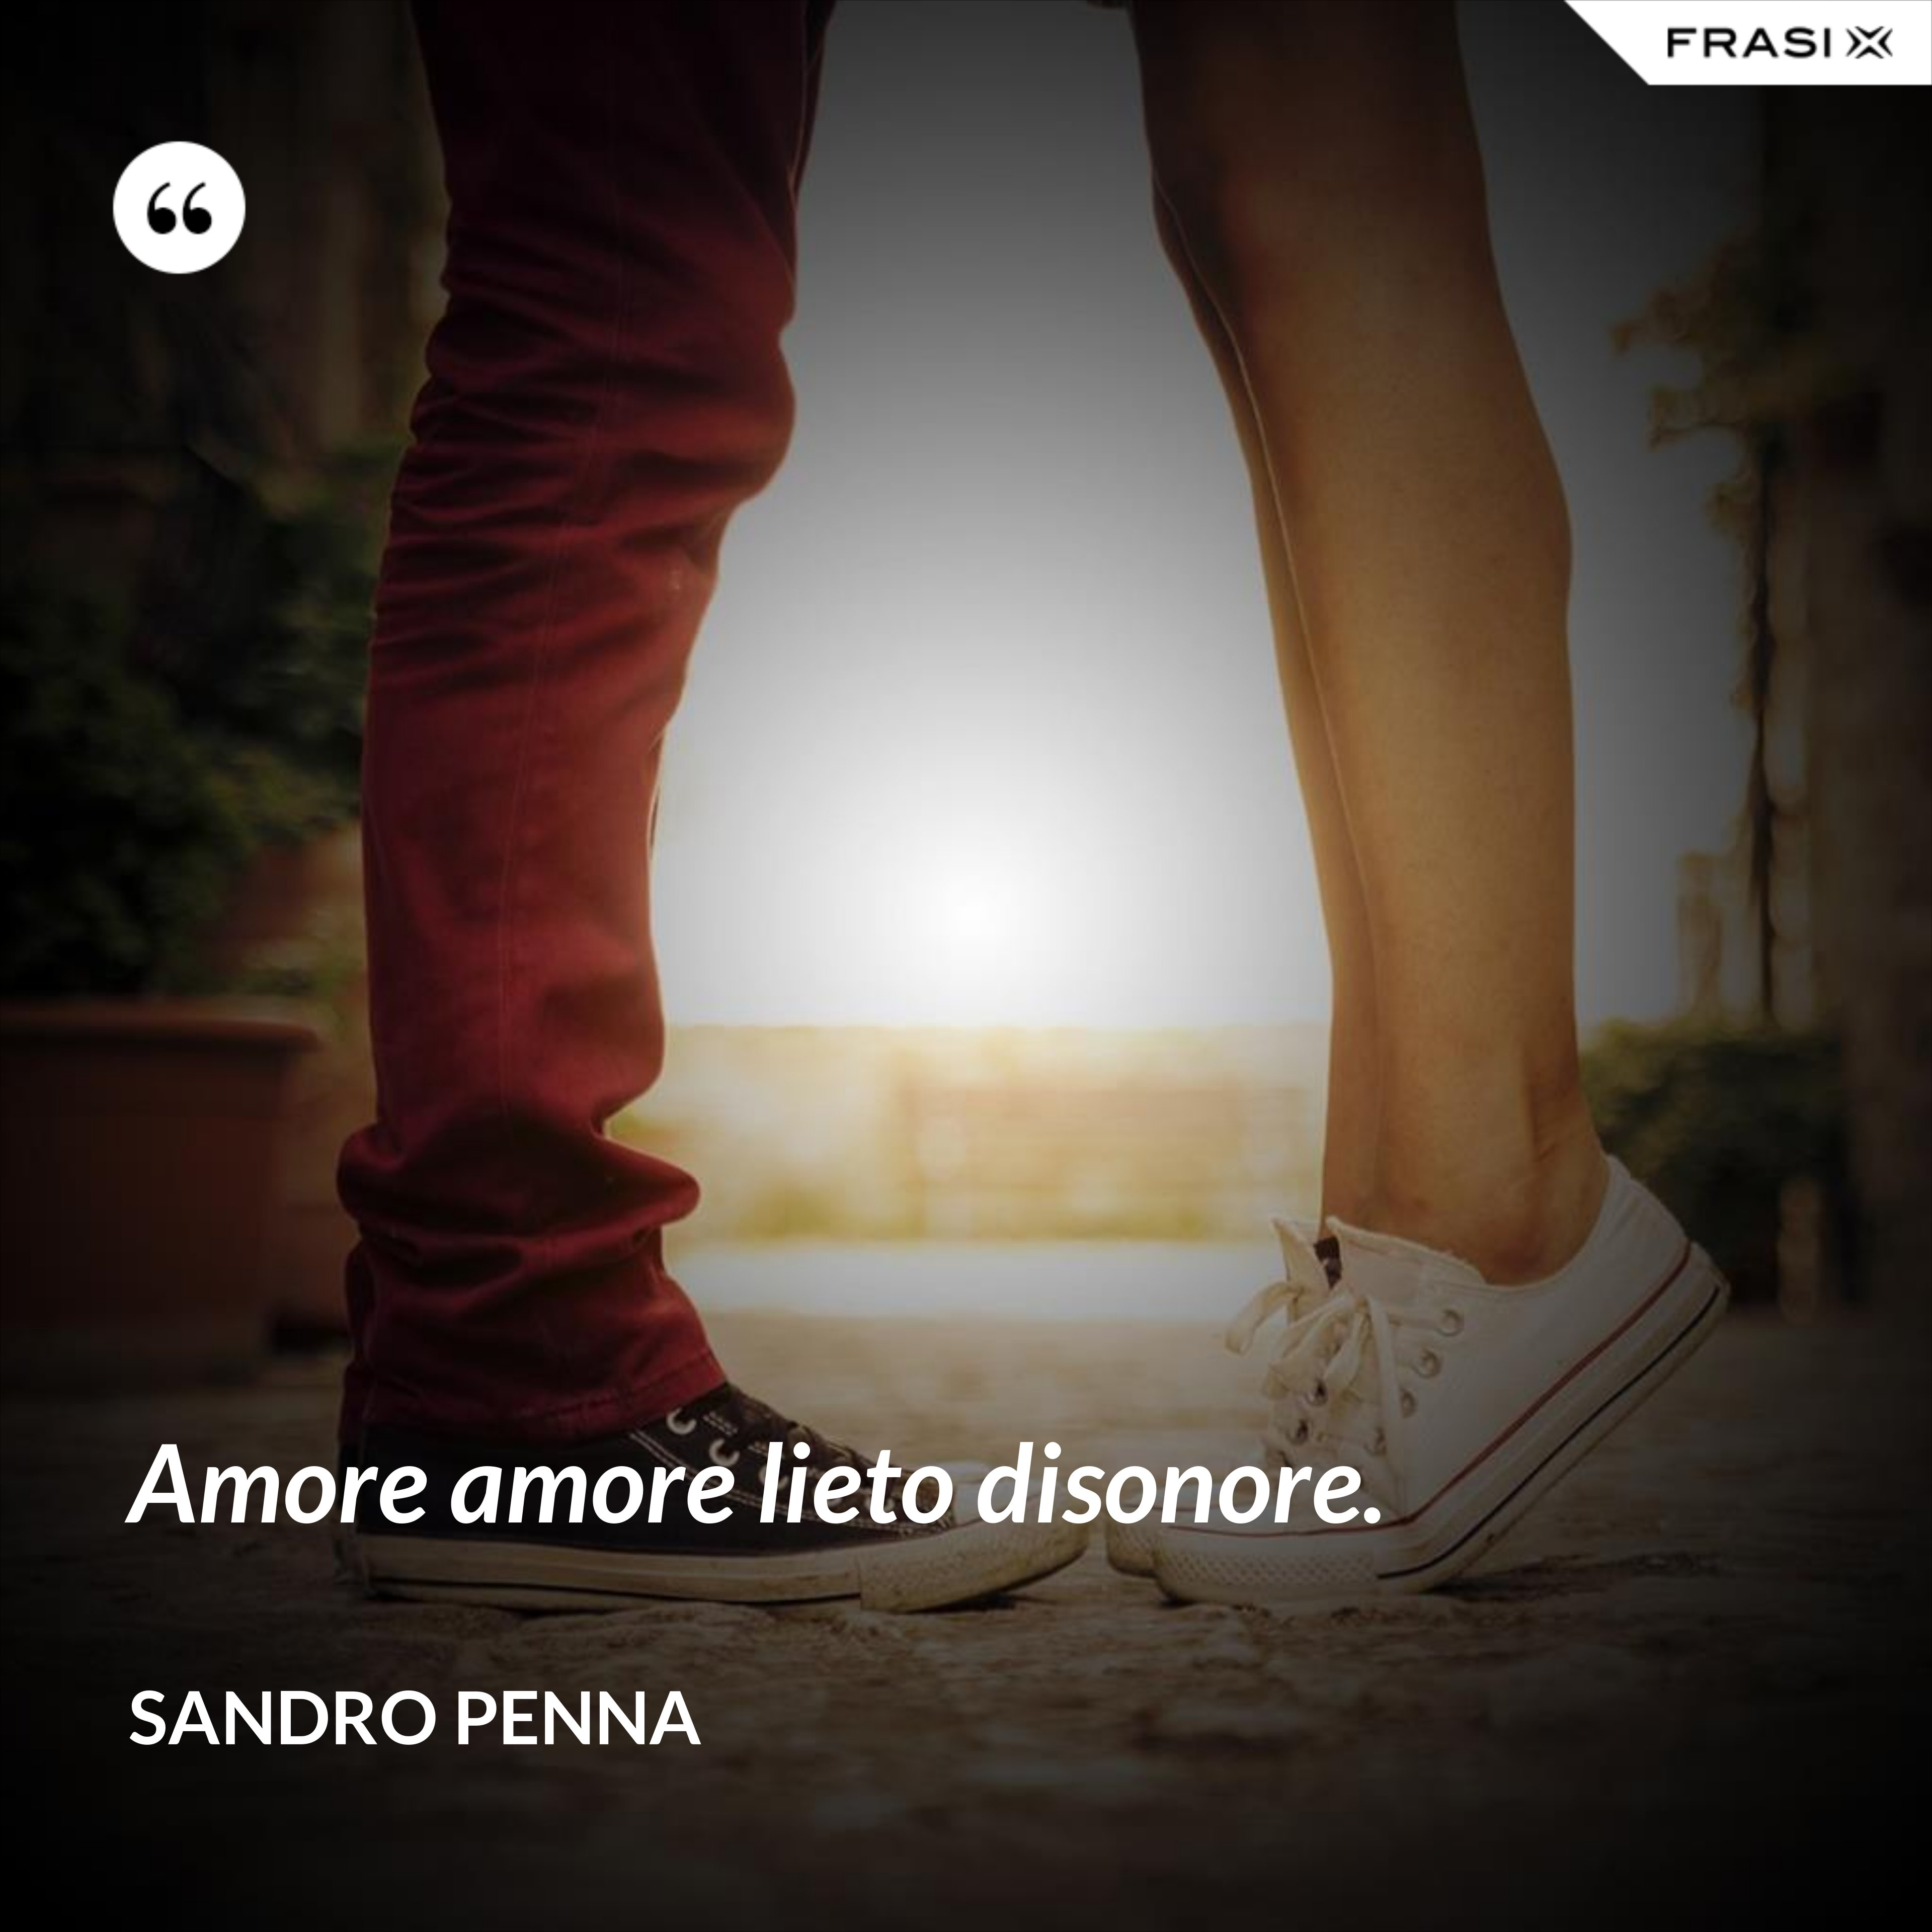 Amore amore lieto disonore. - Sandro Penna